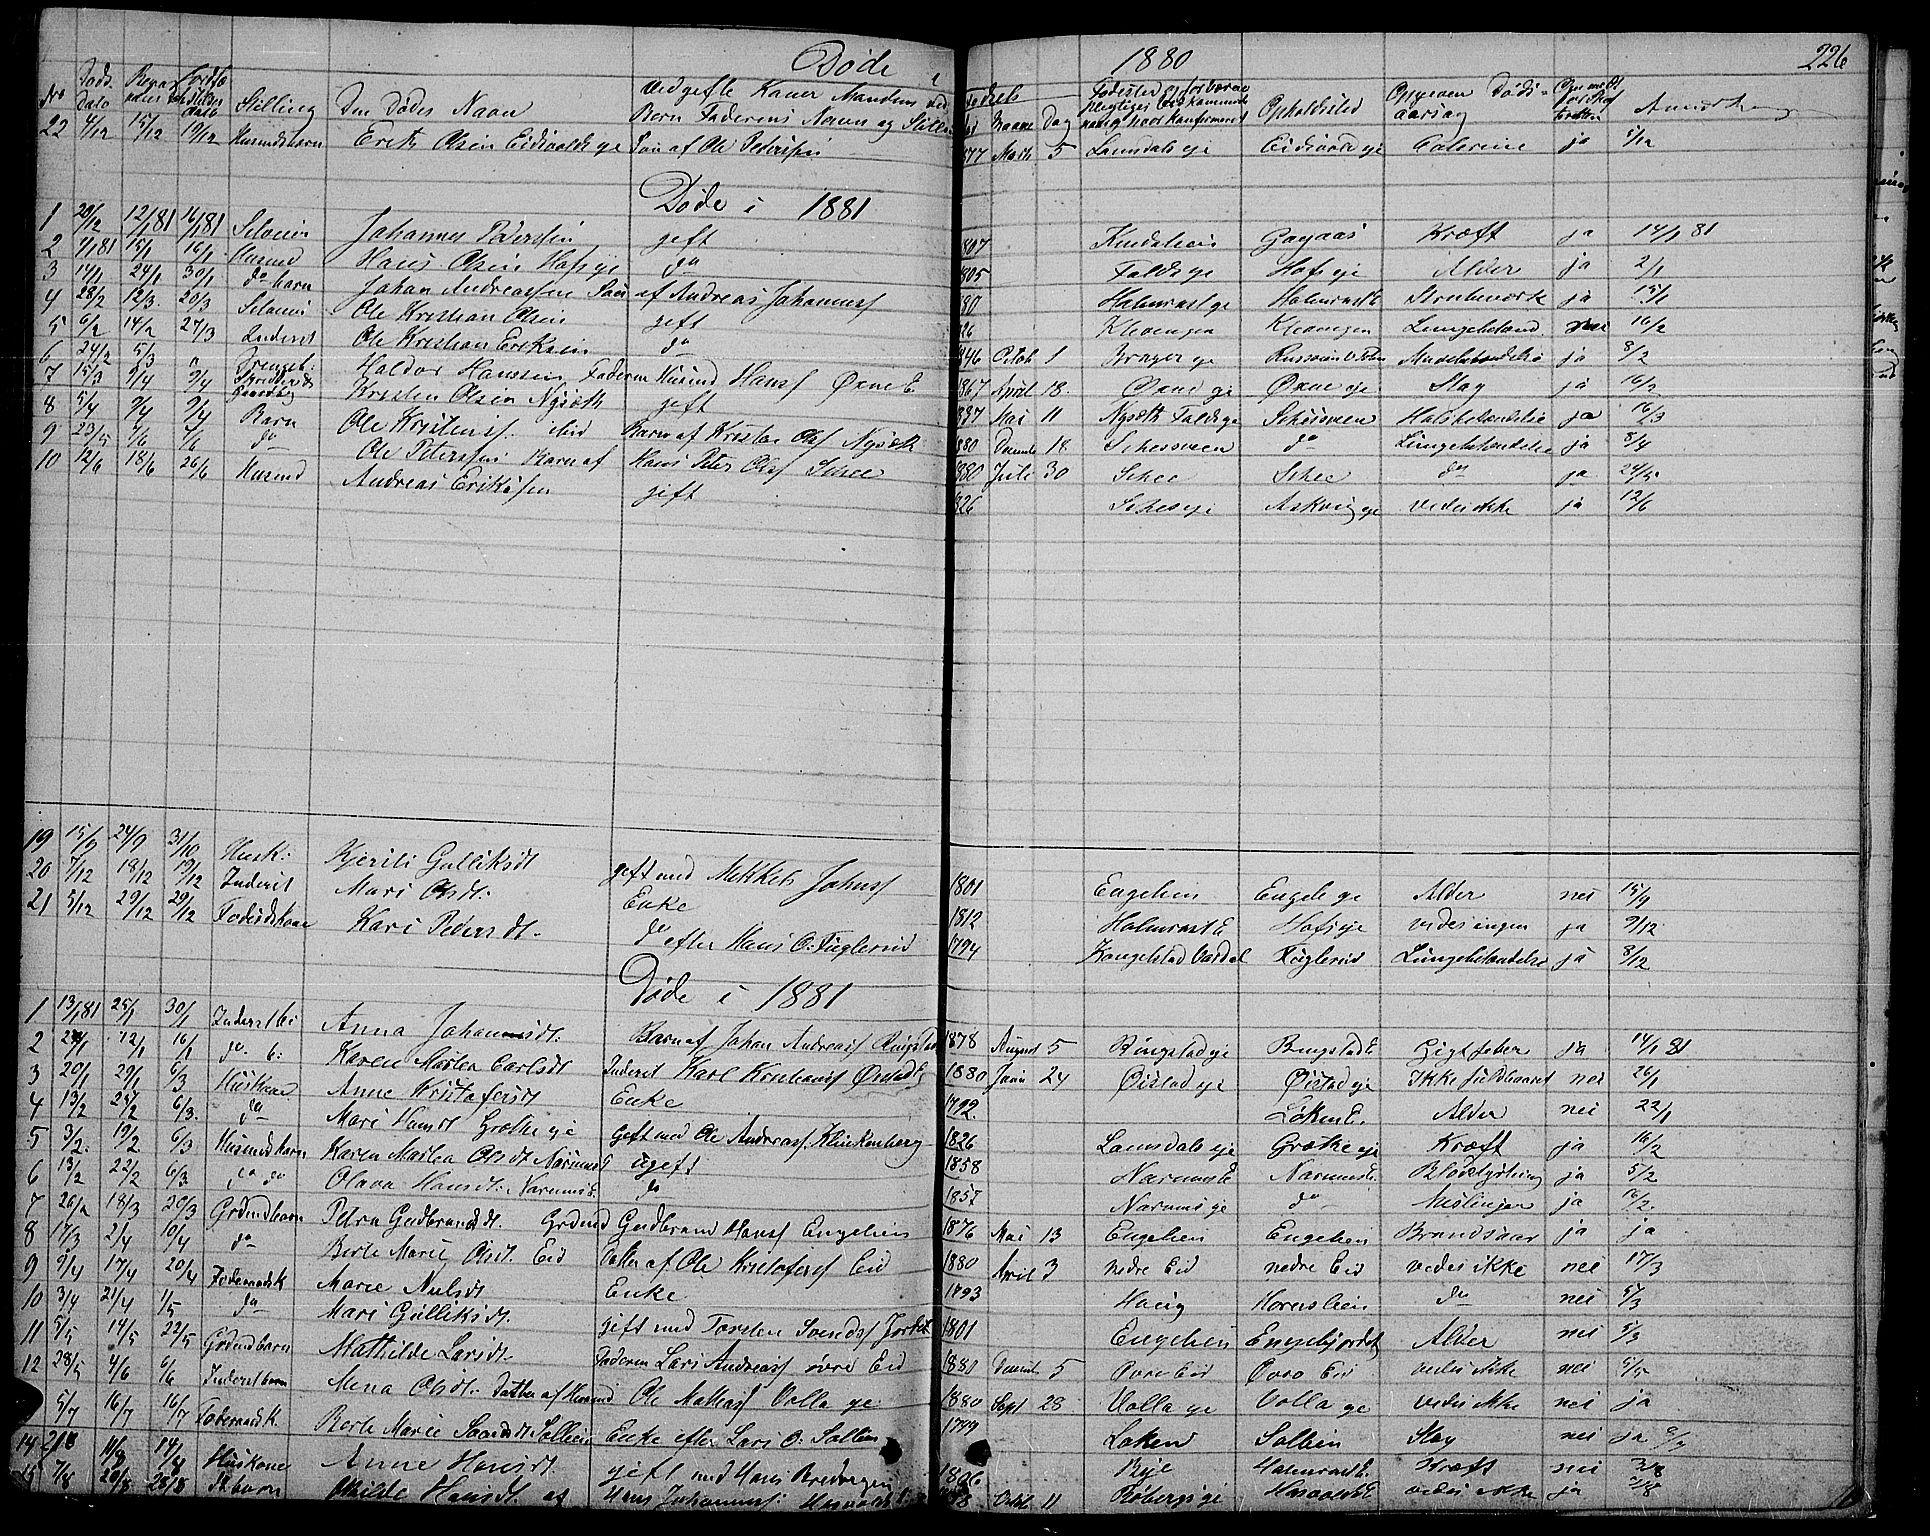 SAH, Søndre Land prestekontor, L/L0001: Klokkerbok nr. 1, 1849-1883, s. 226